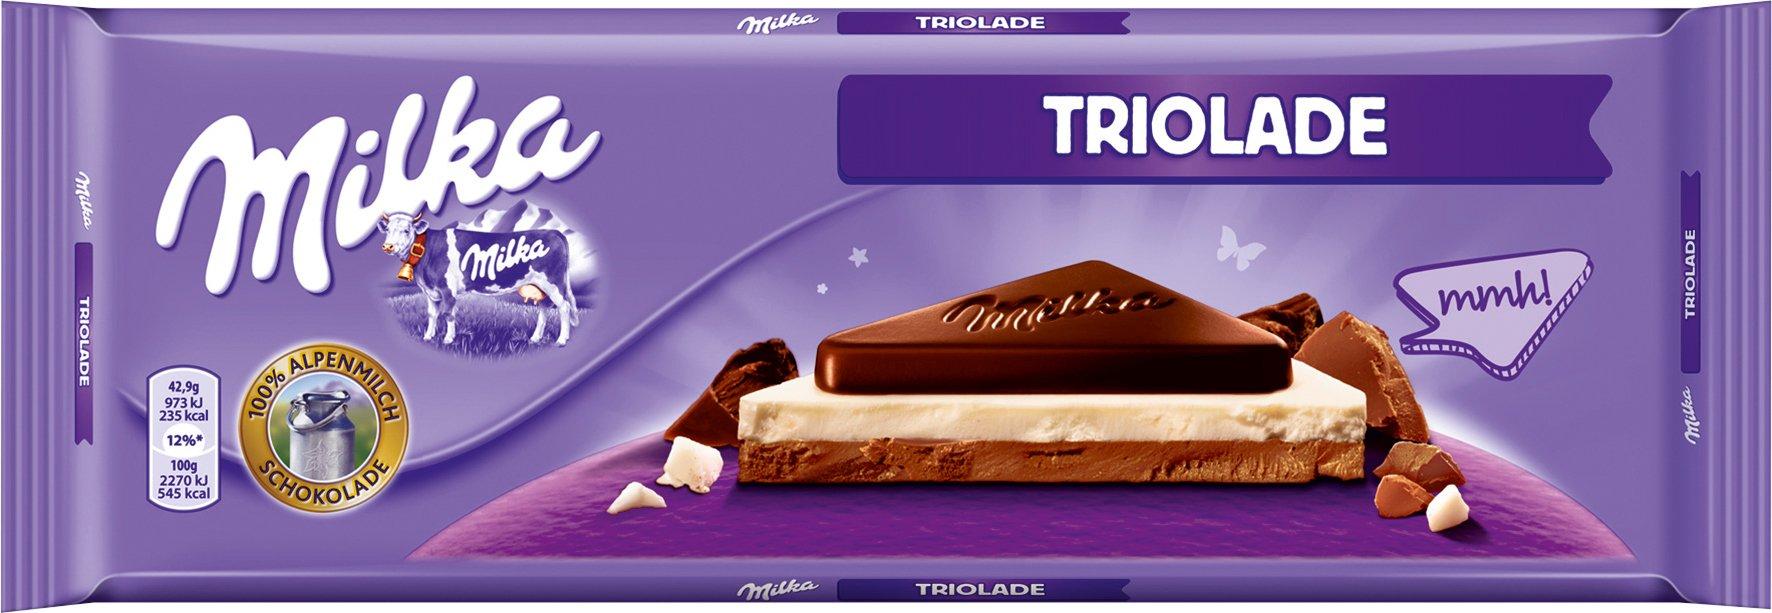 Milka Triolade Chocolate Large ( 300g ) by Milka